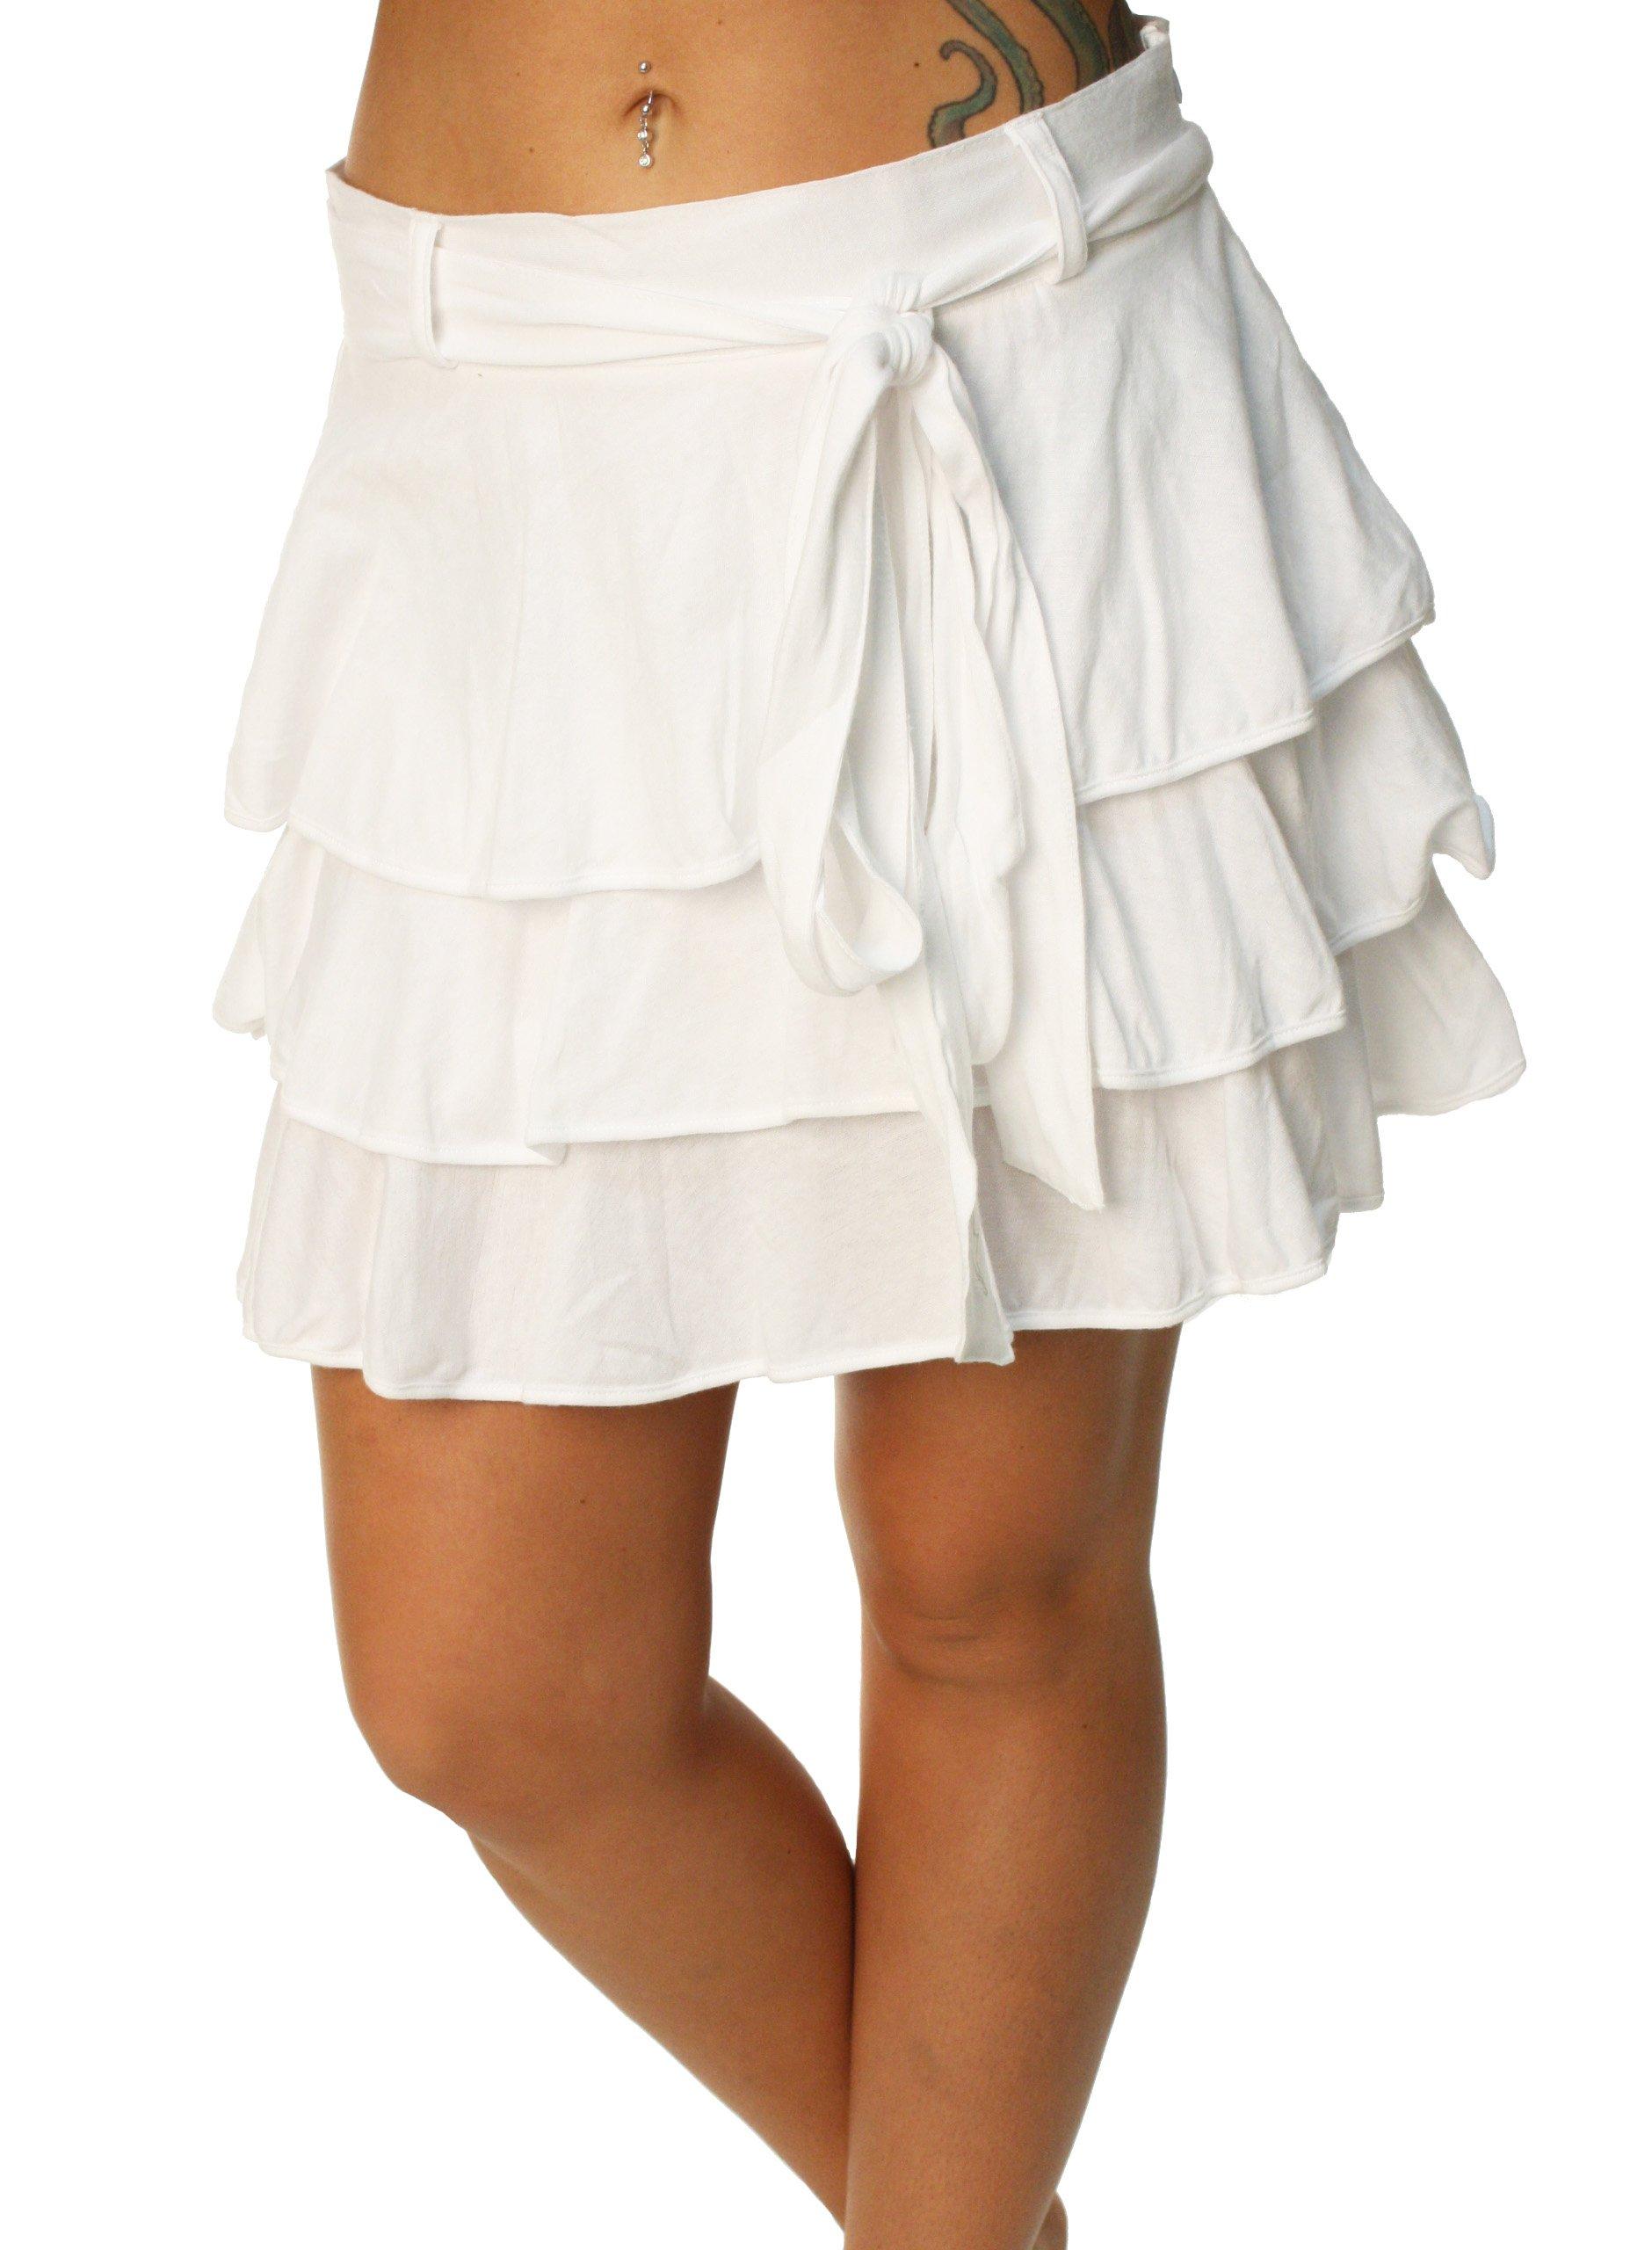 Alpinestars Women's Gauze Tiered Frill Mini Skirt-Large white